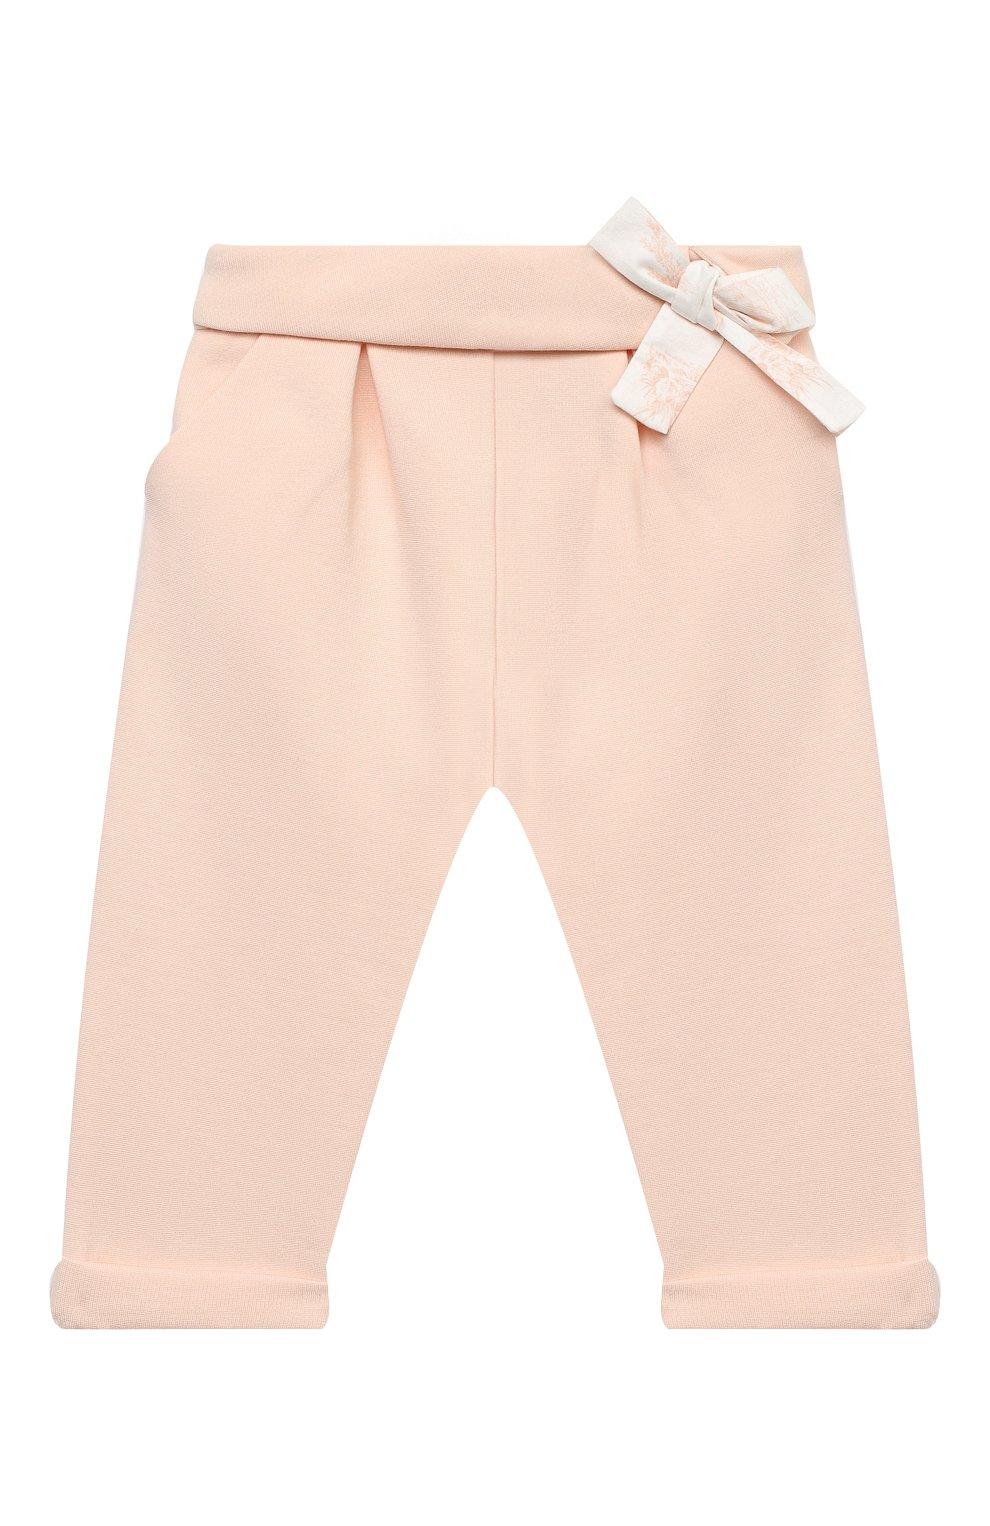 Детские брюки CHLOÉ светло-розового цвета, арт. C04172 | Фото 1